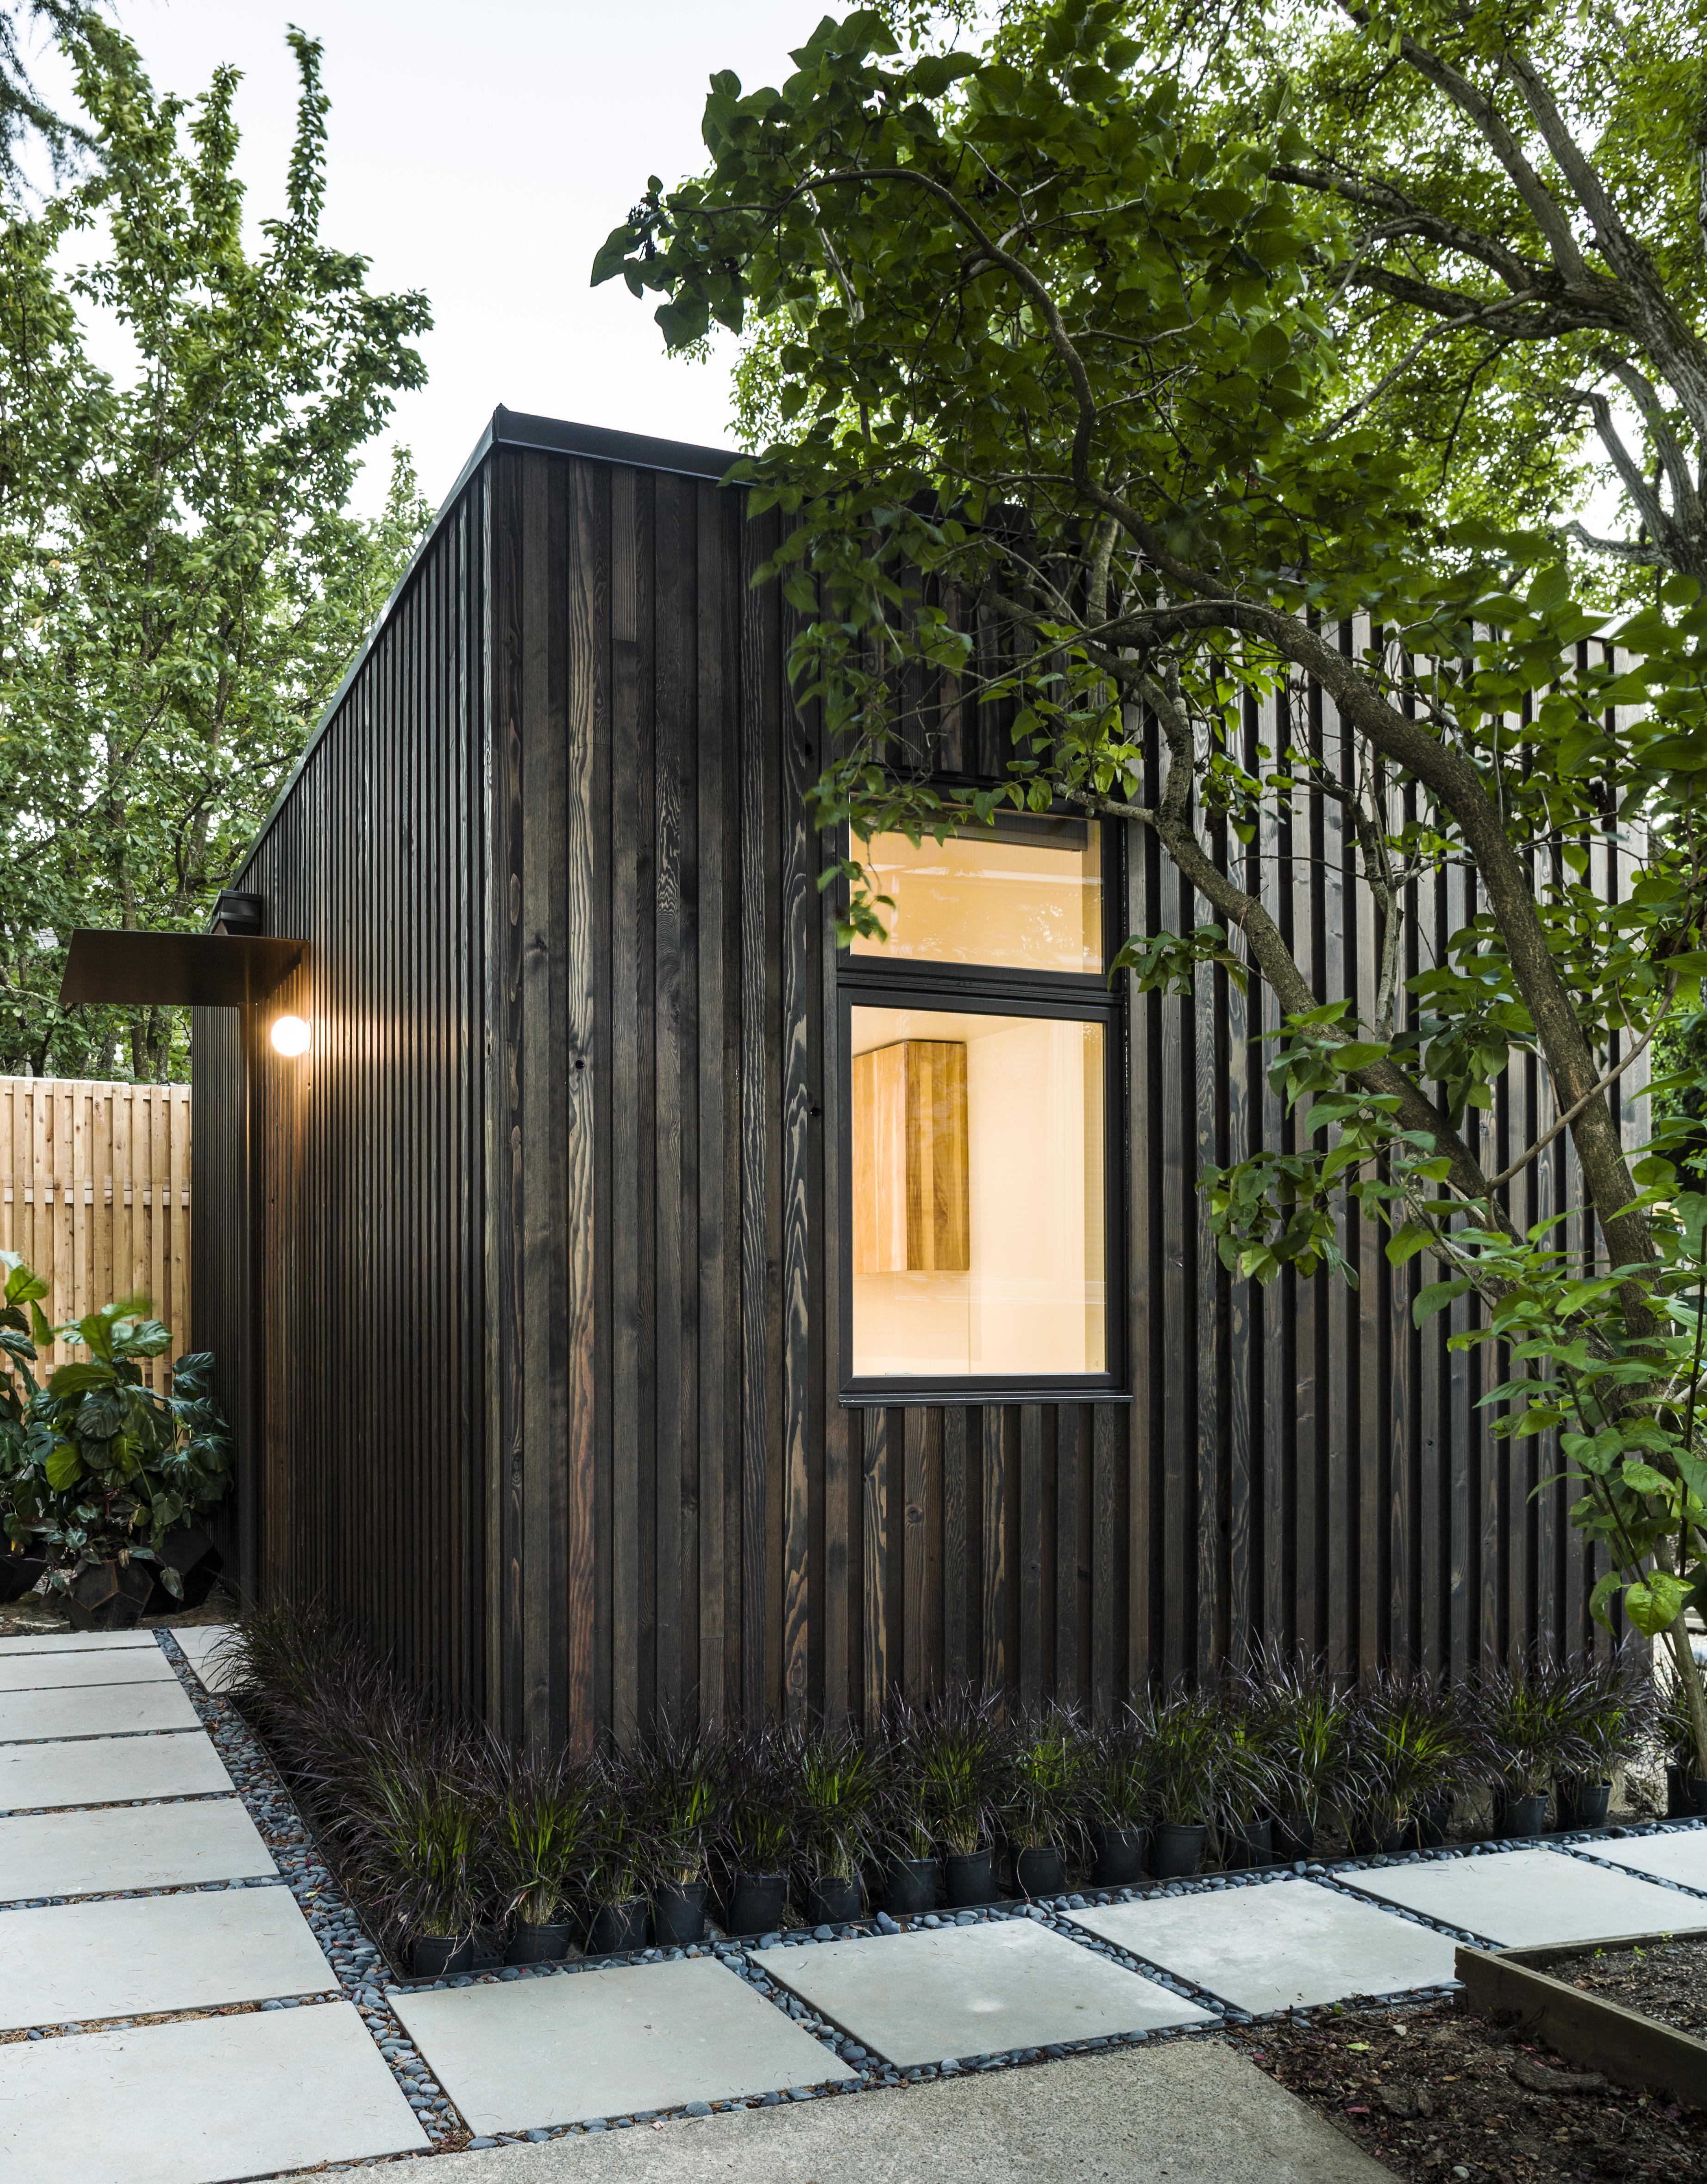 Best Tiny Home Designs: Architect Magazine